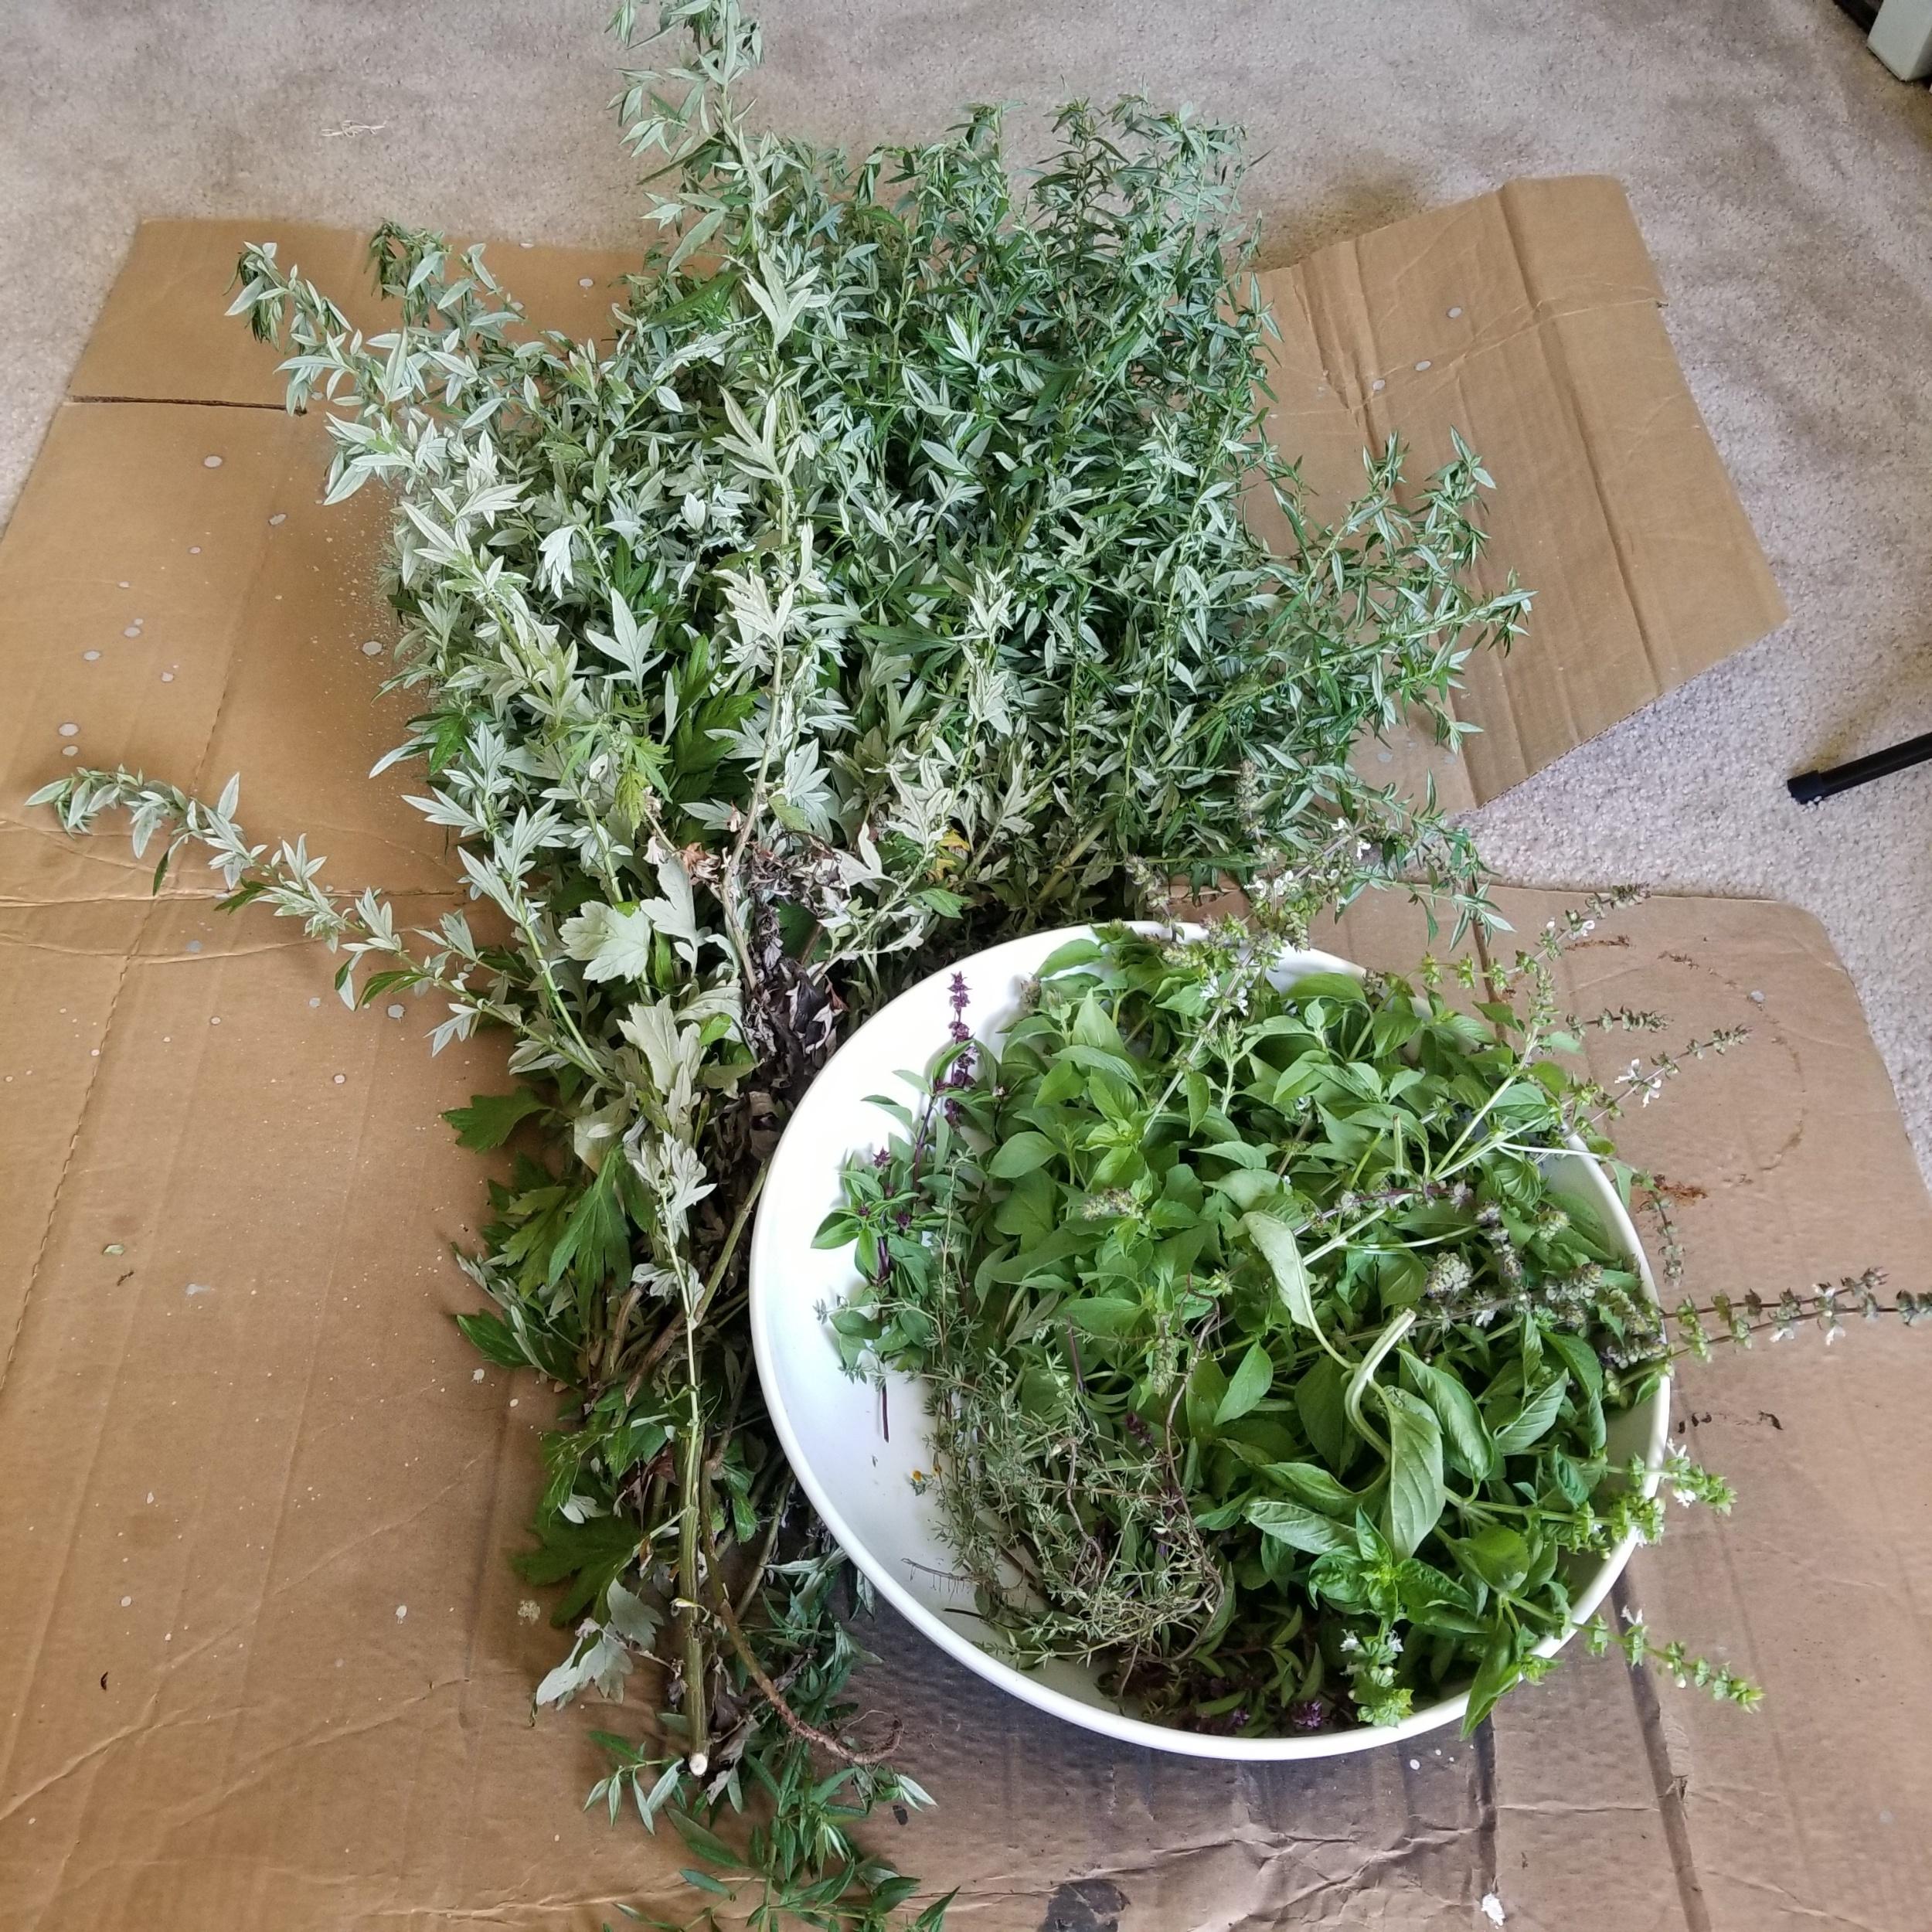 Mugwort & assorted herbs